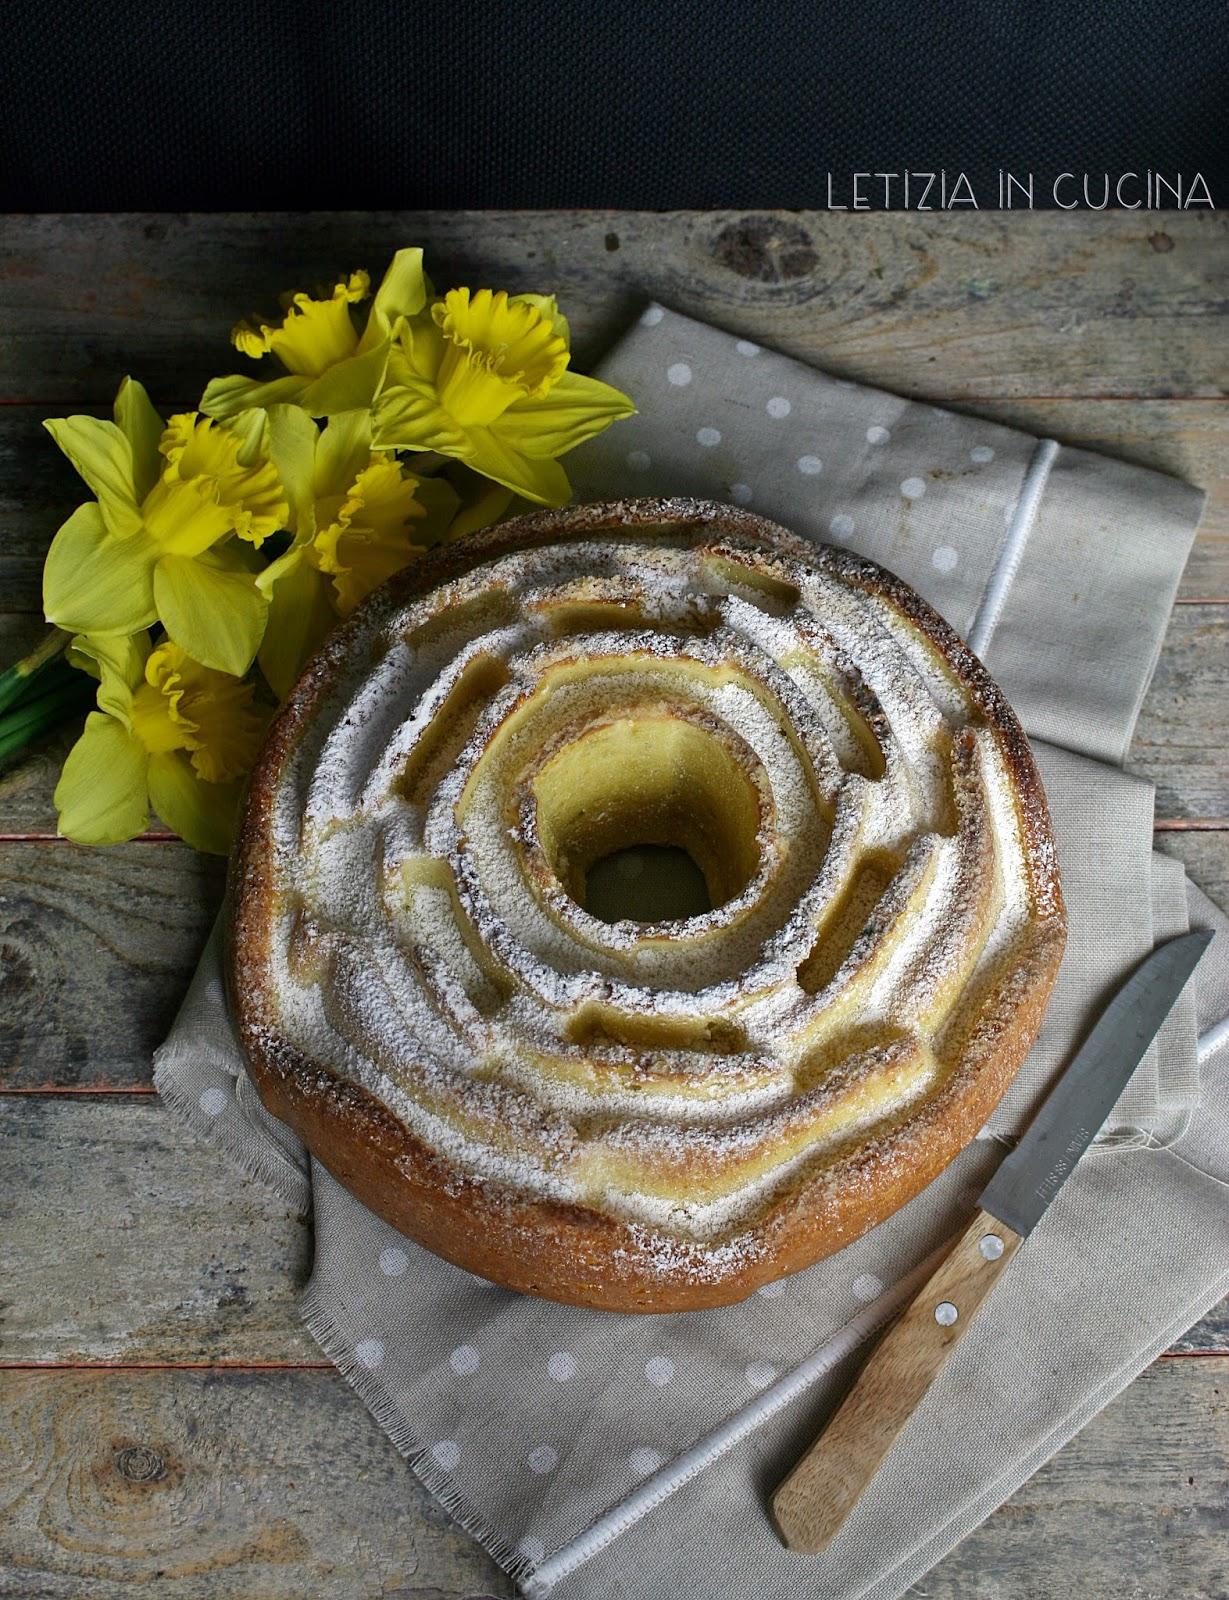 Letizia in Cucina: Ciambella alla panna calda (una hot whipped cream ...